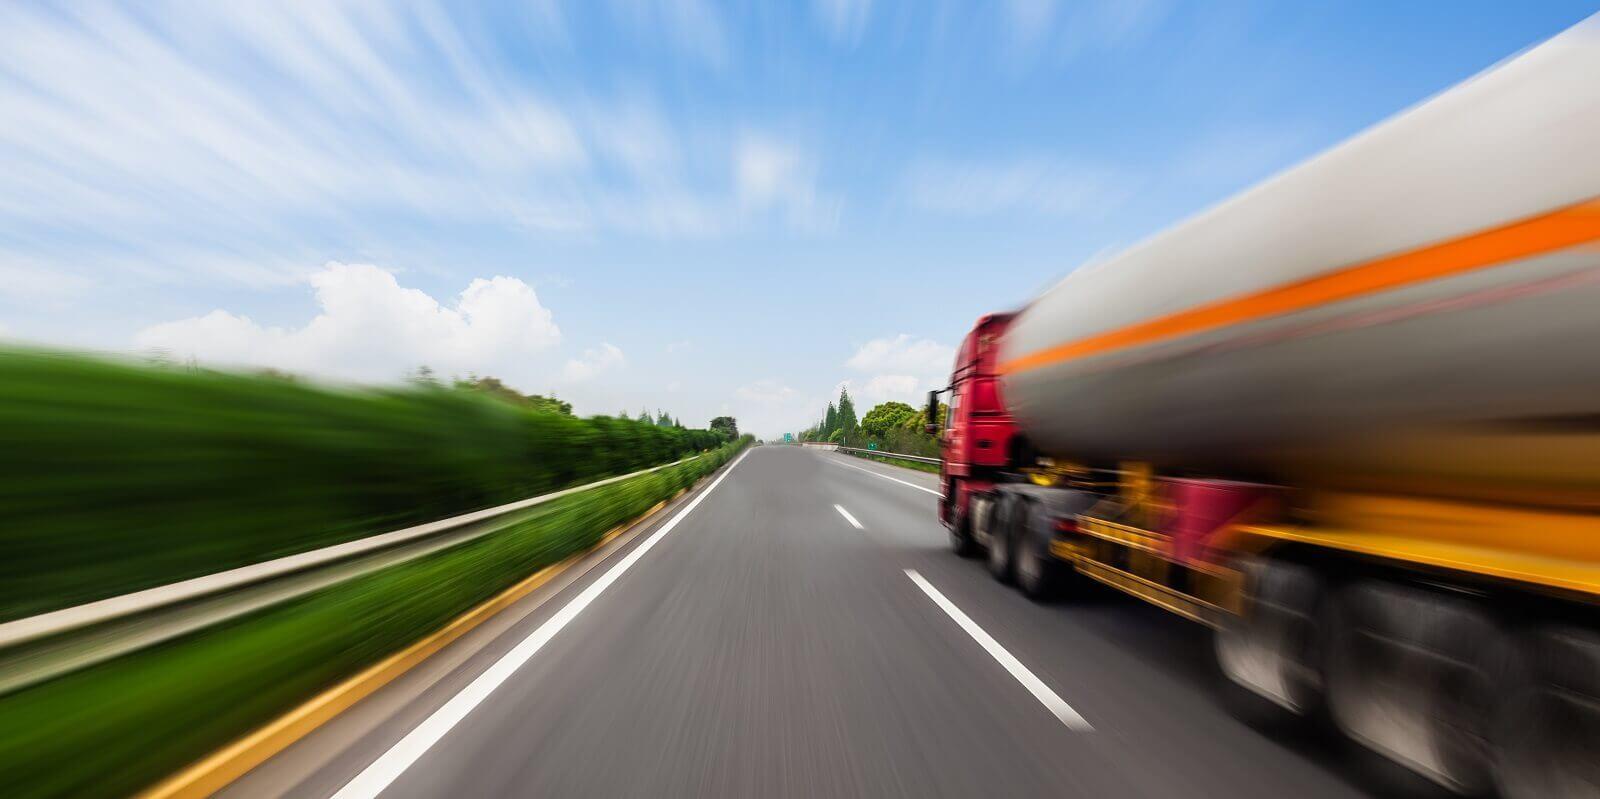 Tanker truck. Hoefon Security Seals produces seals for tanker trucks